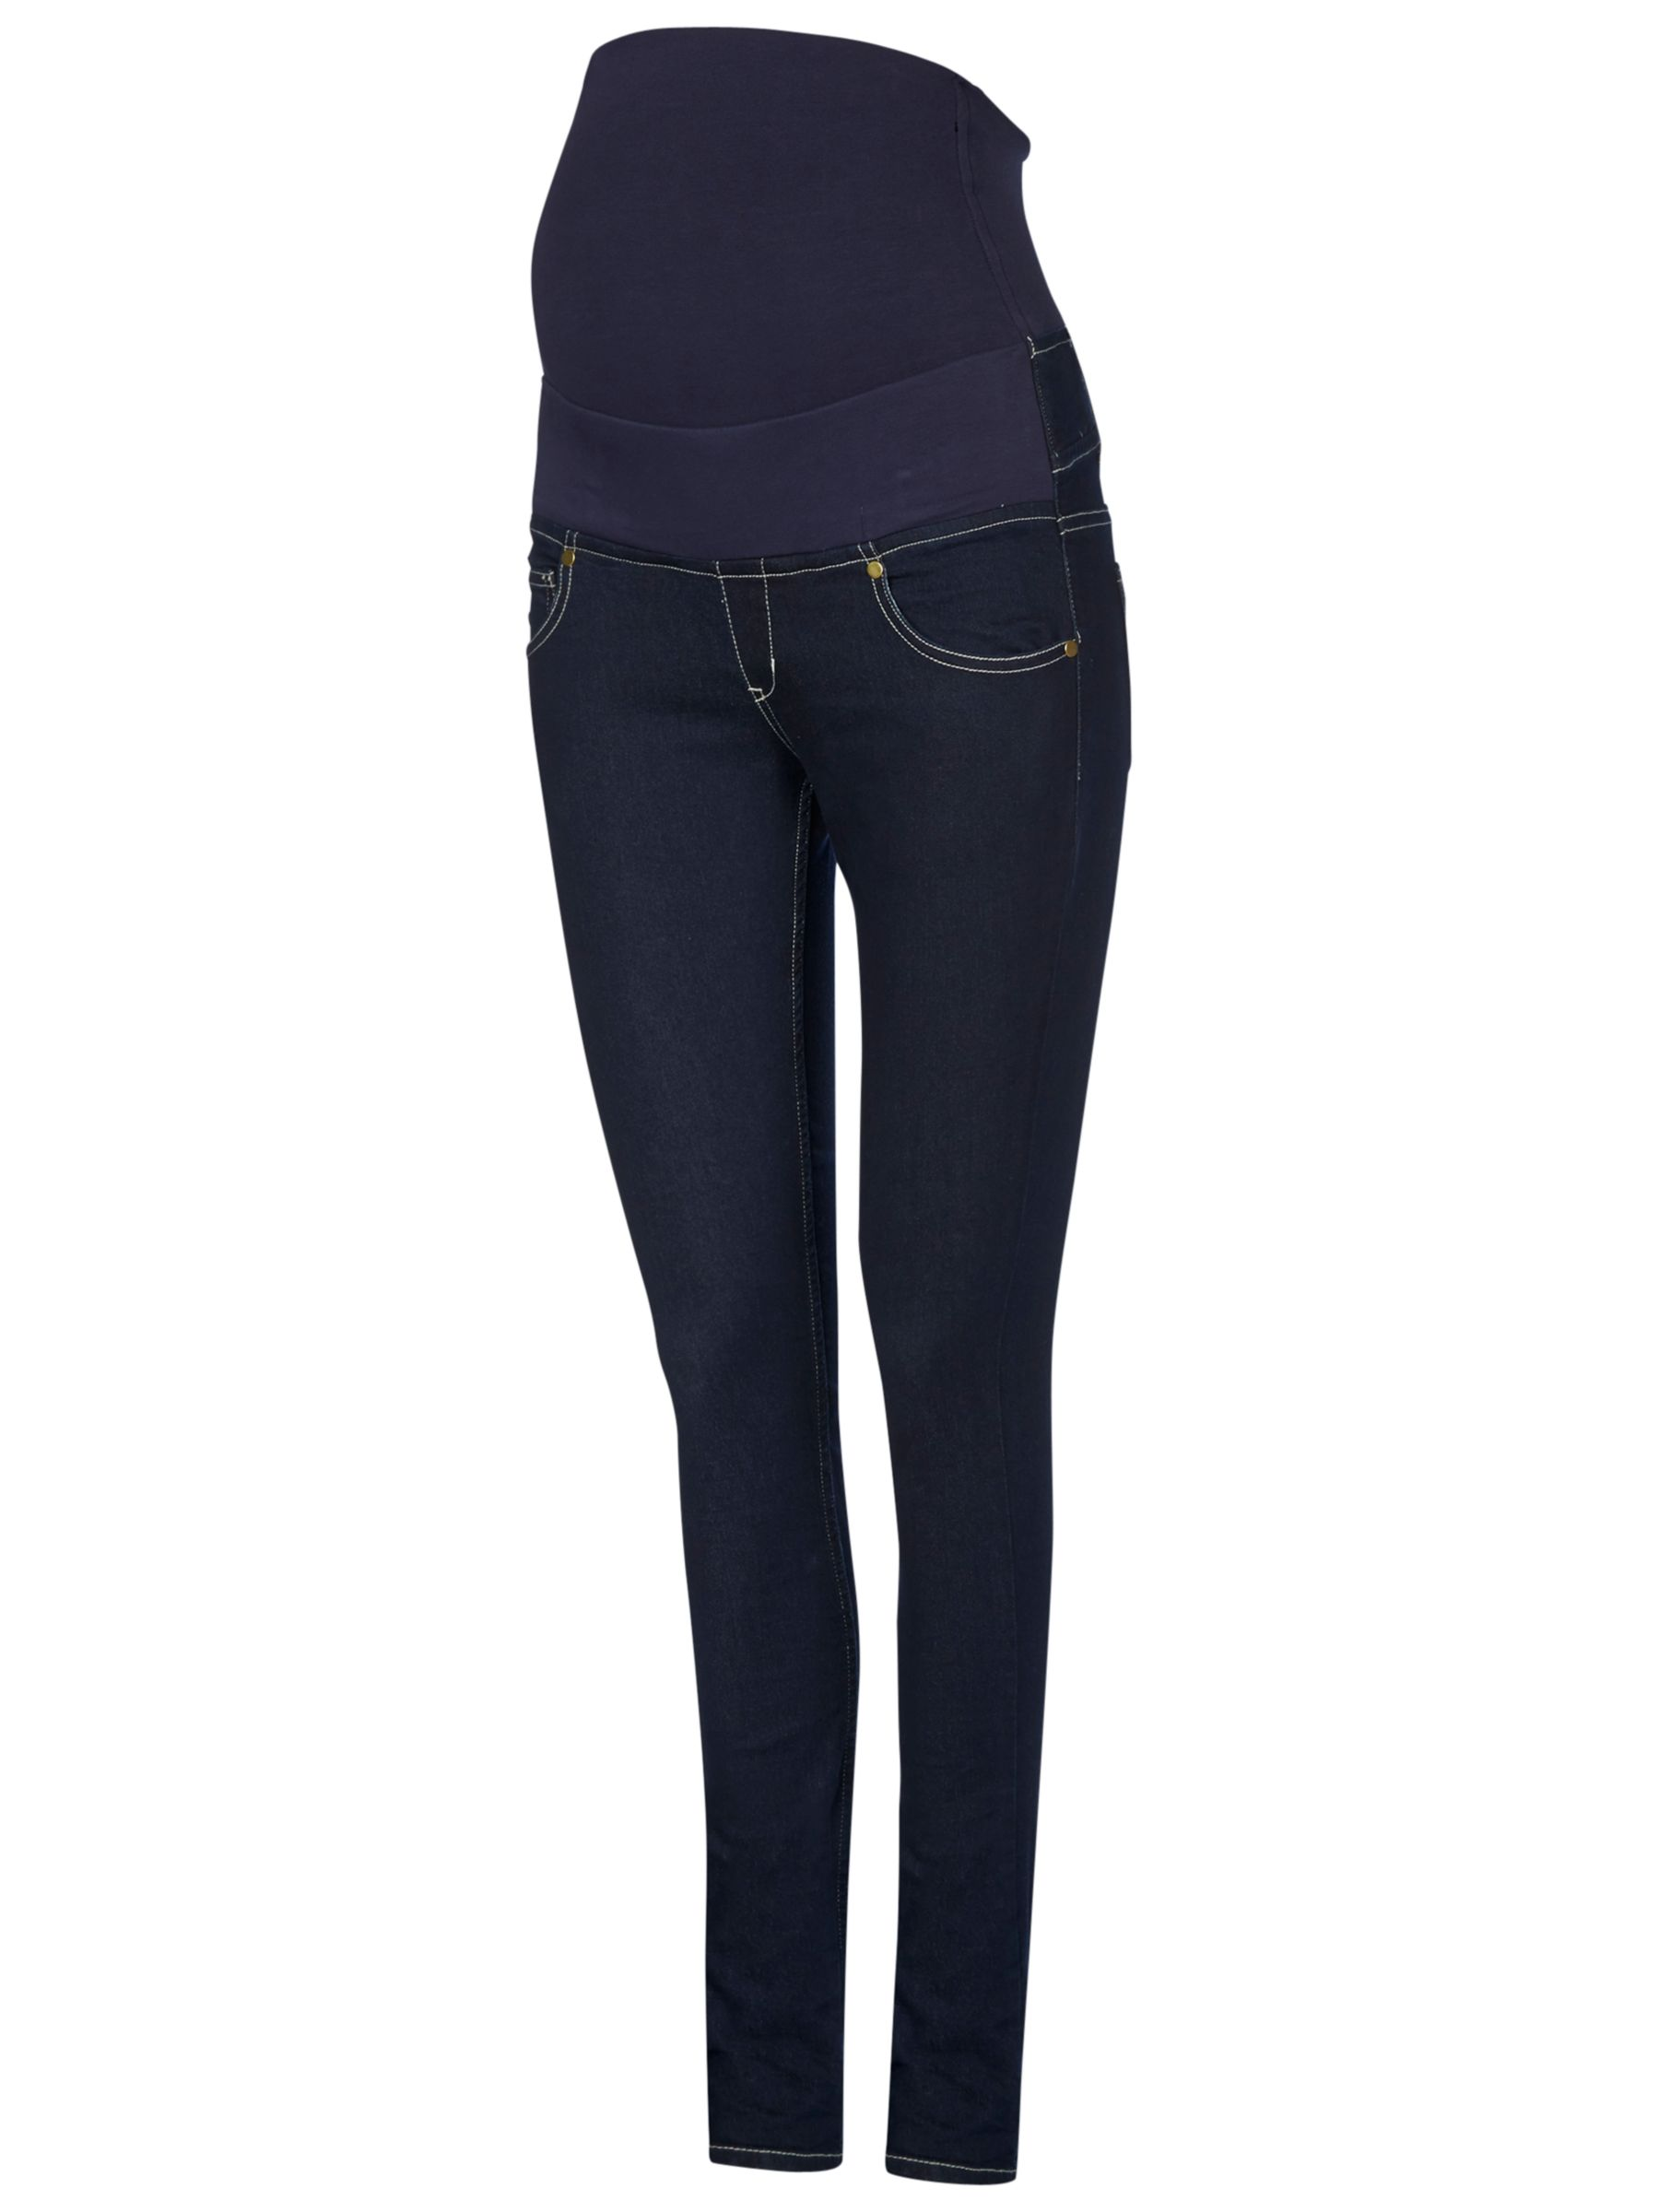 Isabella Oliver Isabella Oliver Zadie Super Stretch Skinny Denim Maternity Jeans, Indigo